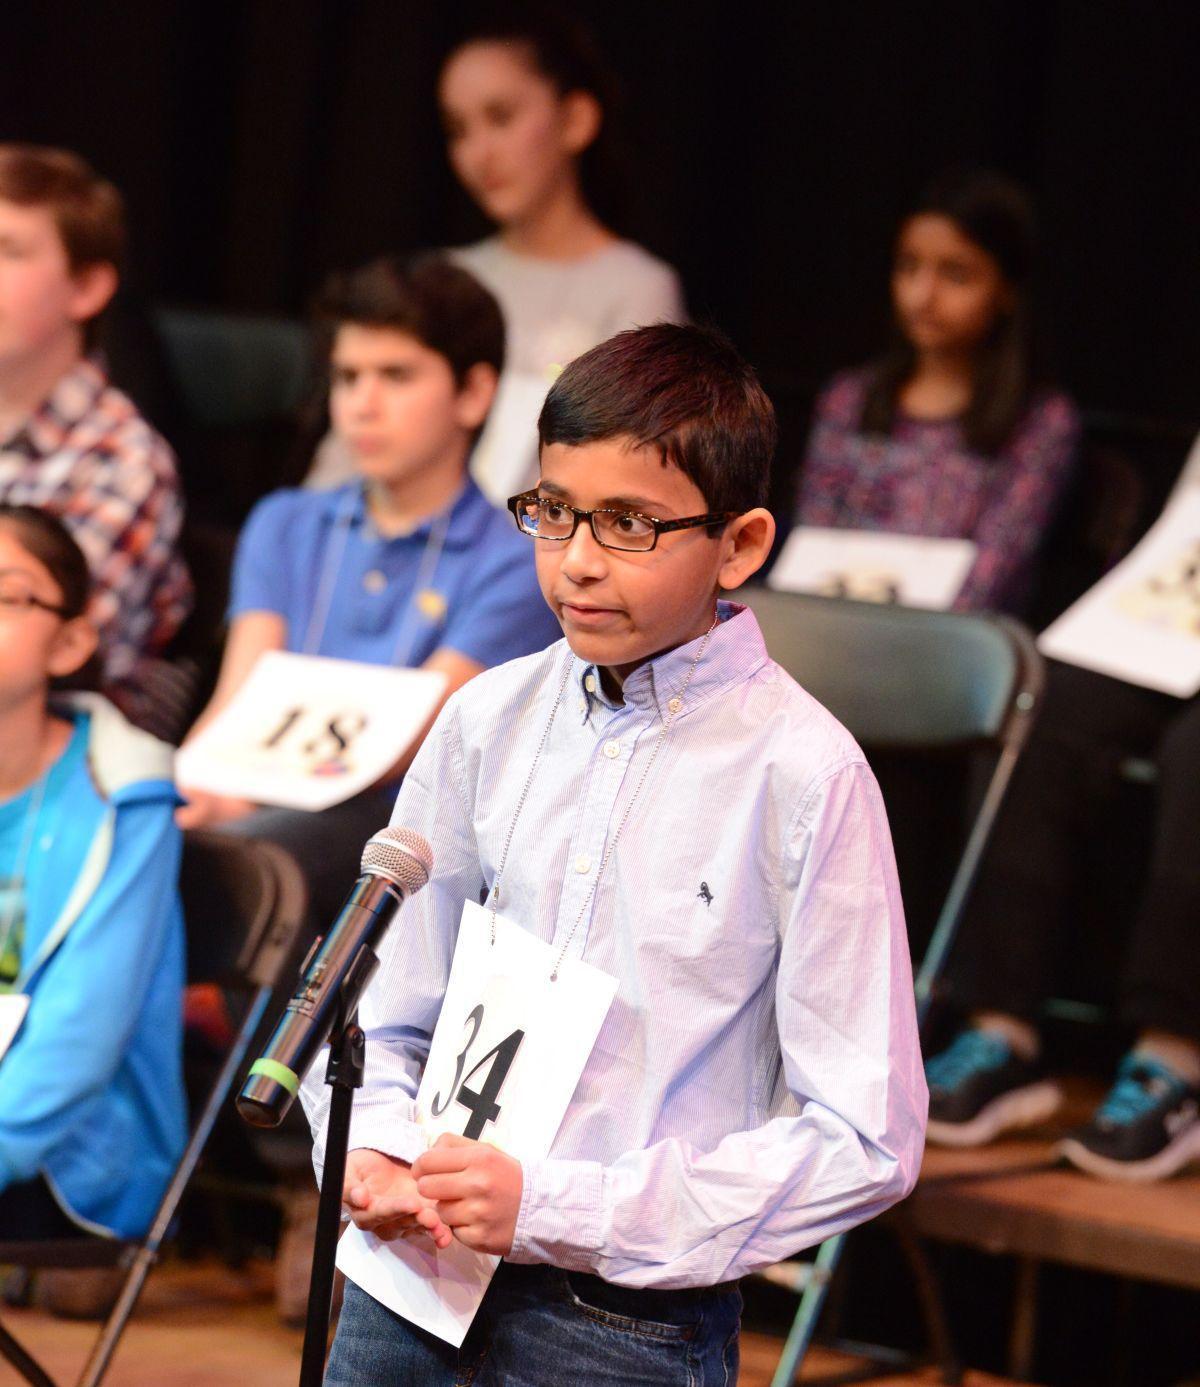 Holland Brook School fifth grader wins Discover Lehigh Valley Regional Spelling Bee